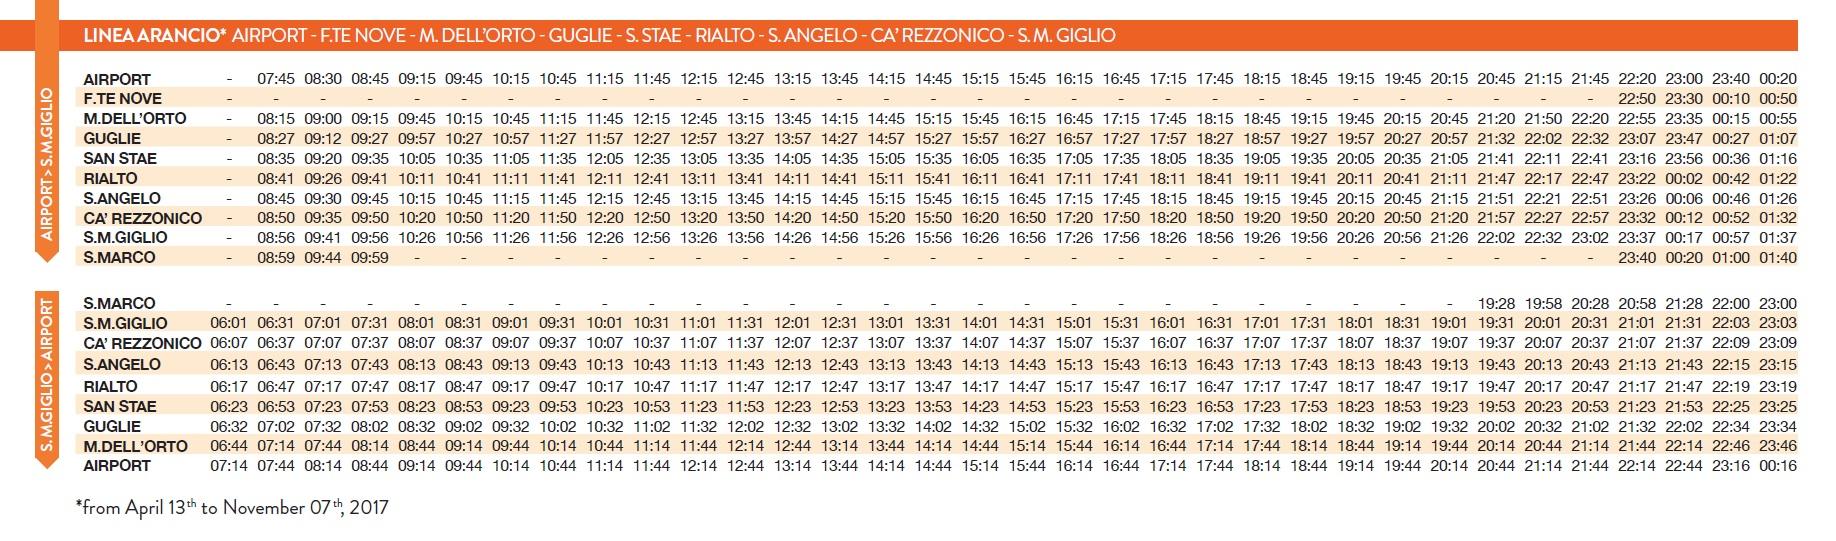 Linea Arancio summer 2017 timetable